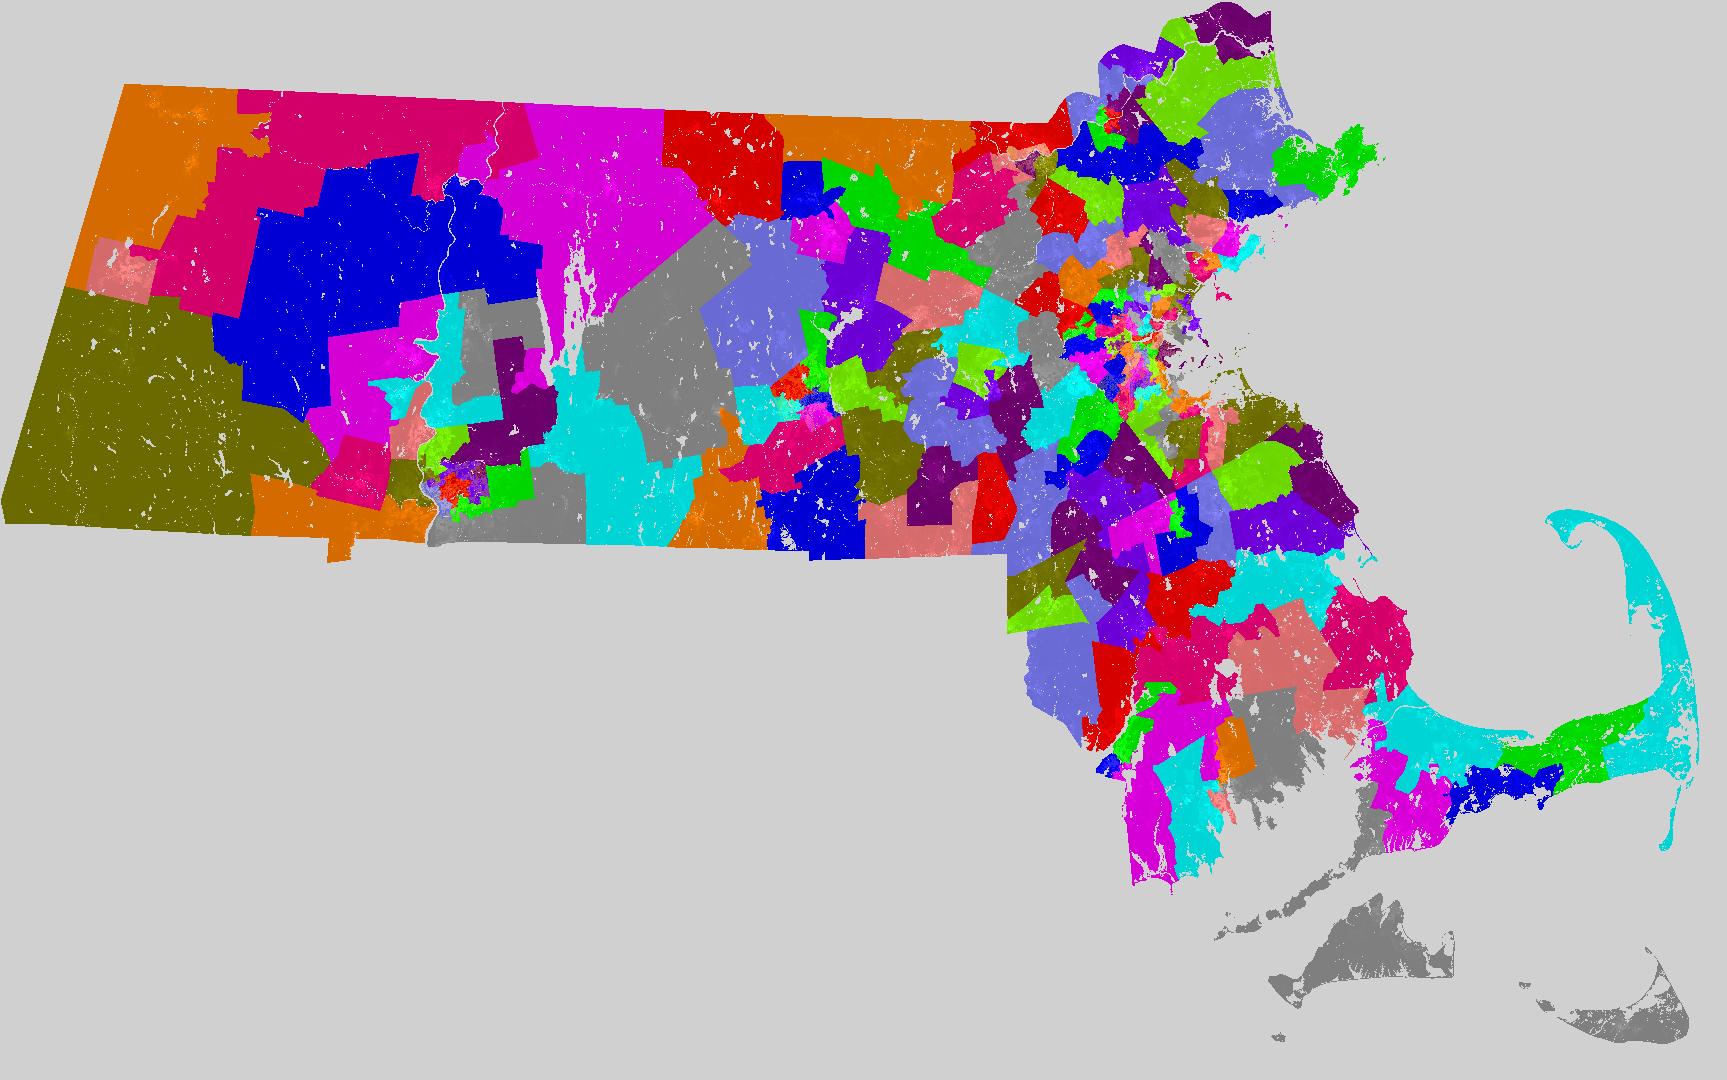 massachusetts house of representatives redistricting